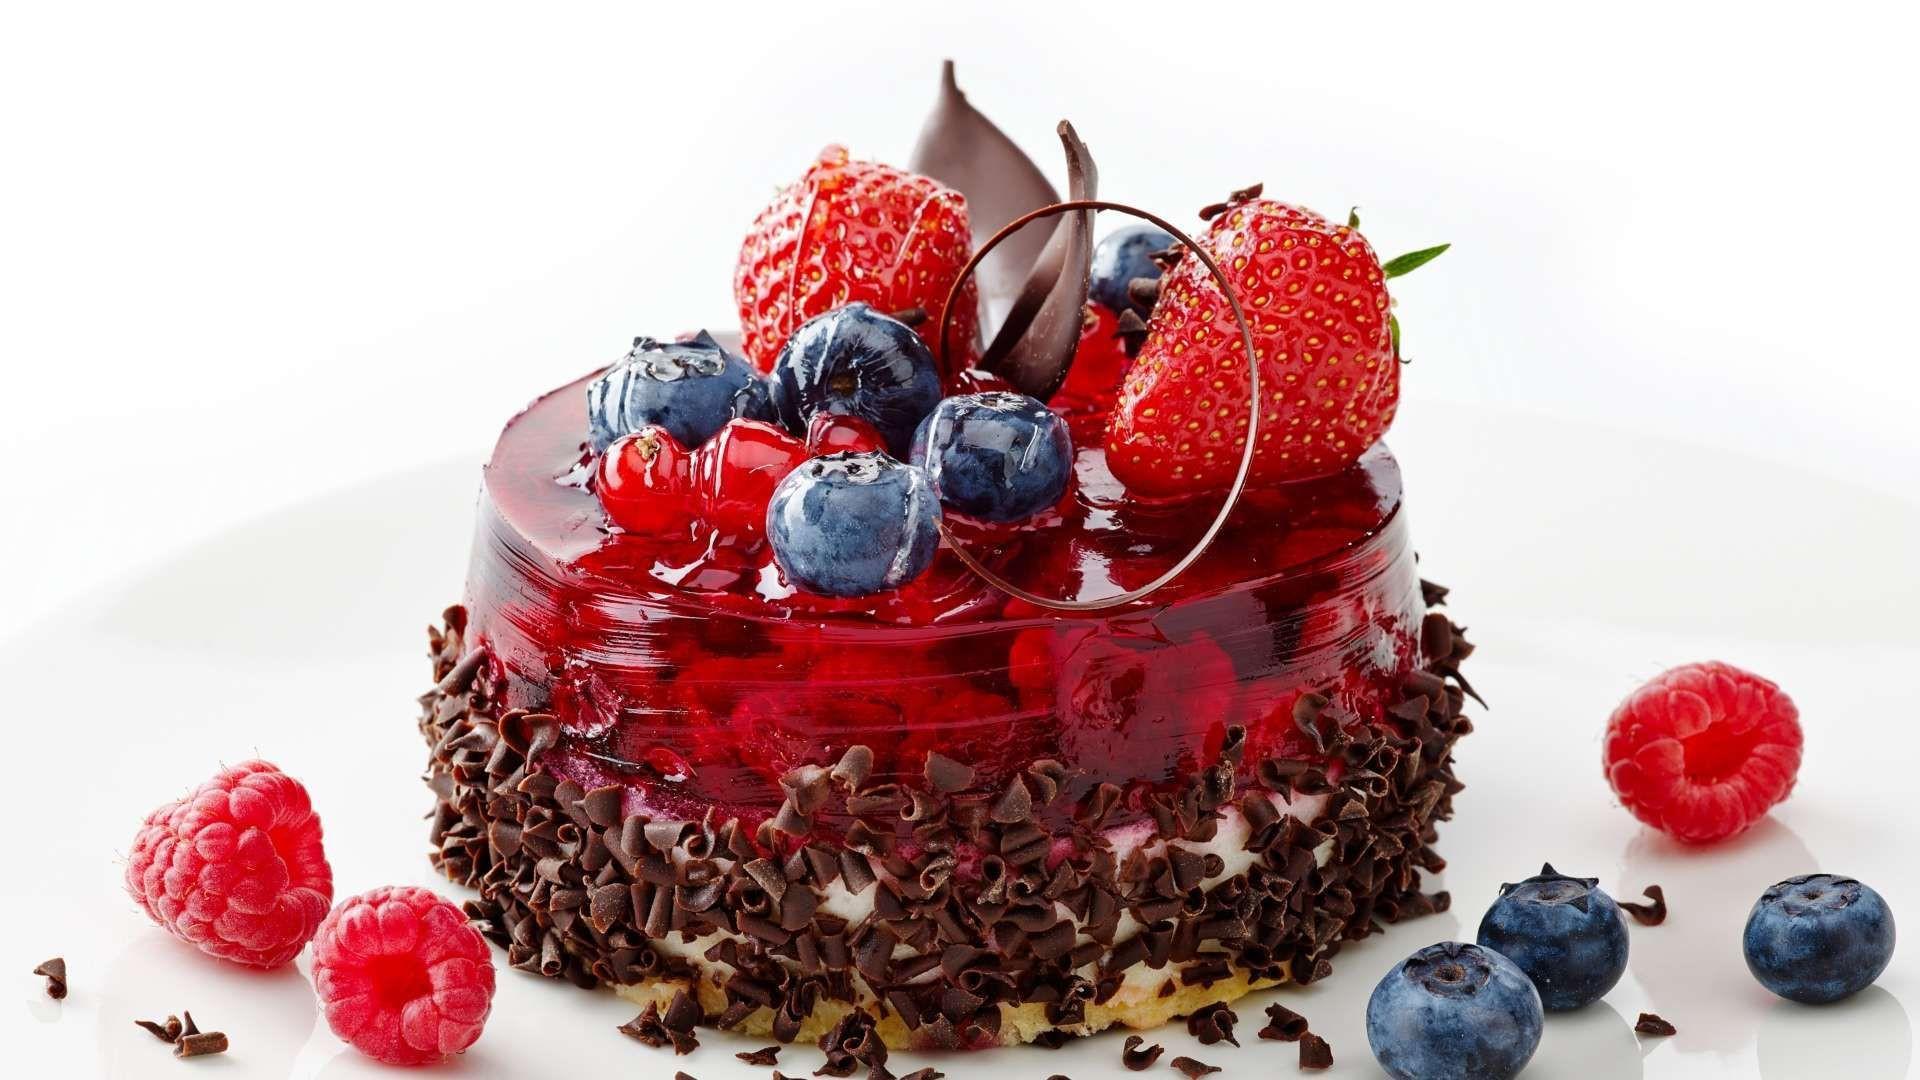 Kiwi Strawberry Chocolate HD desktop wallpaper High Definition